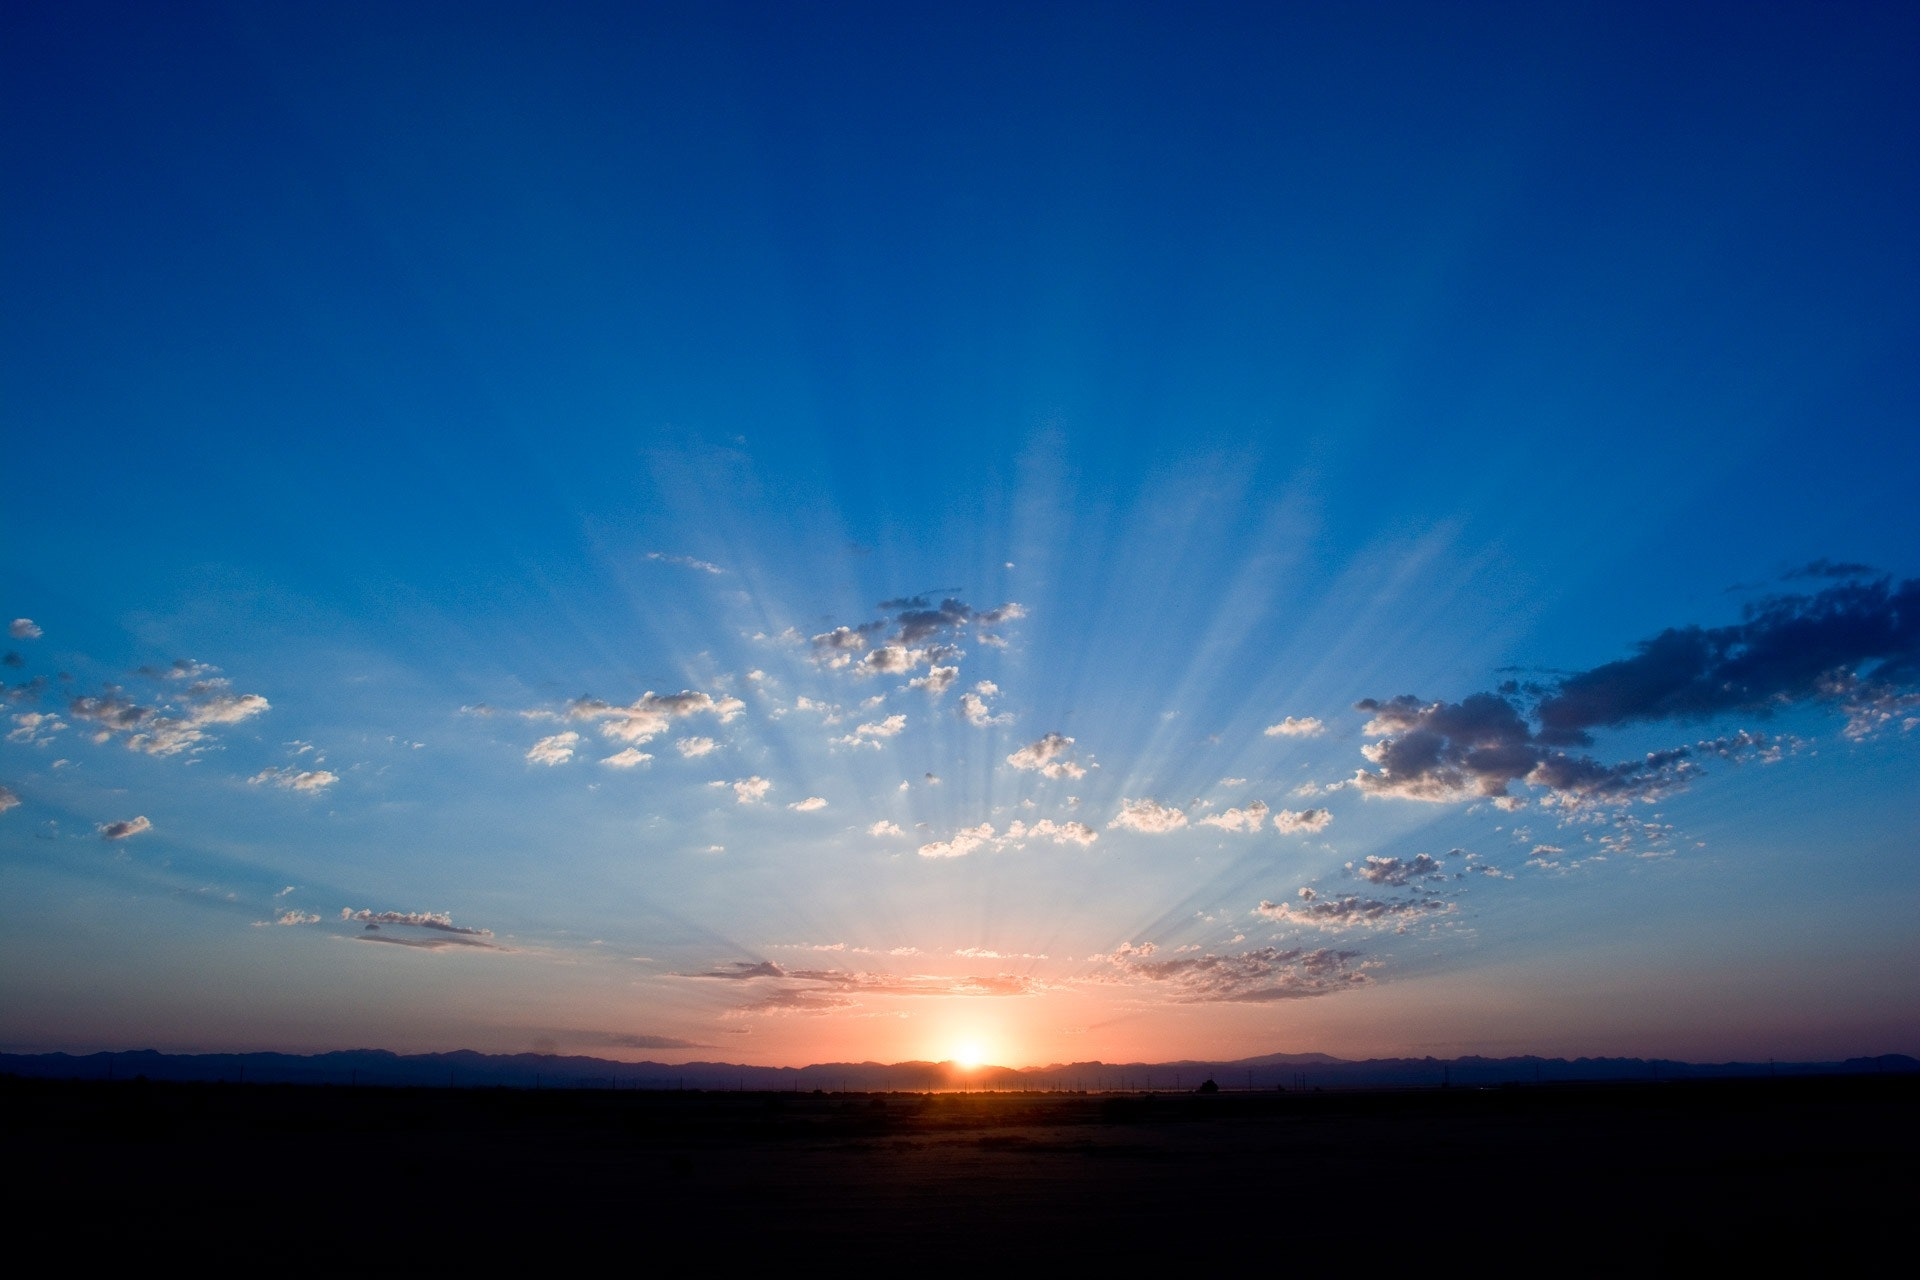 Sunrise Under Cloudy Sky Illustration · Free Stock Photo